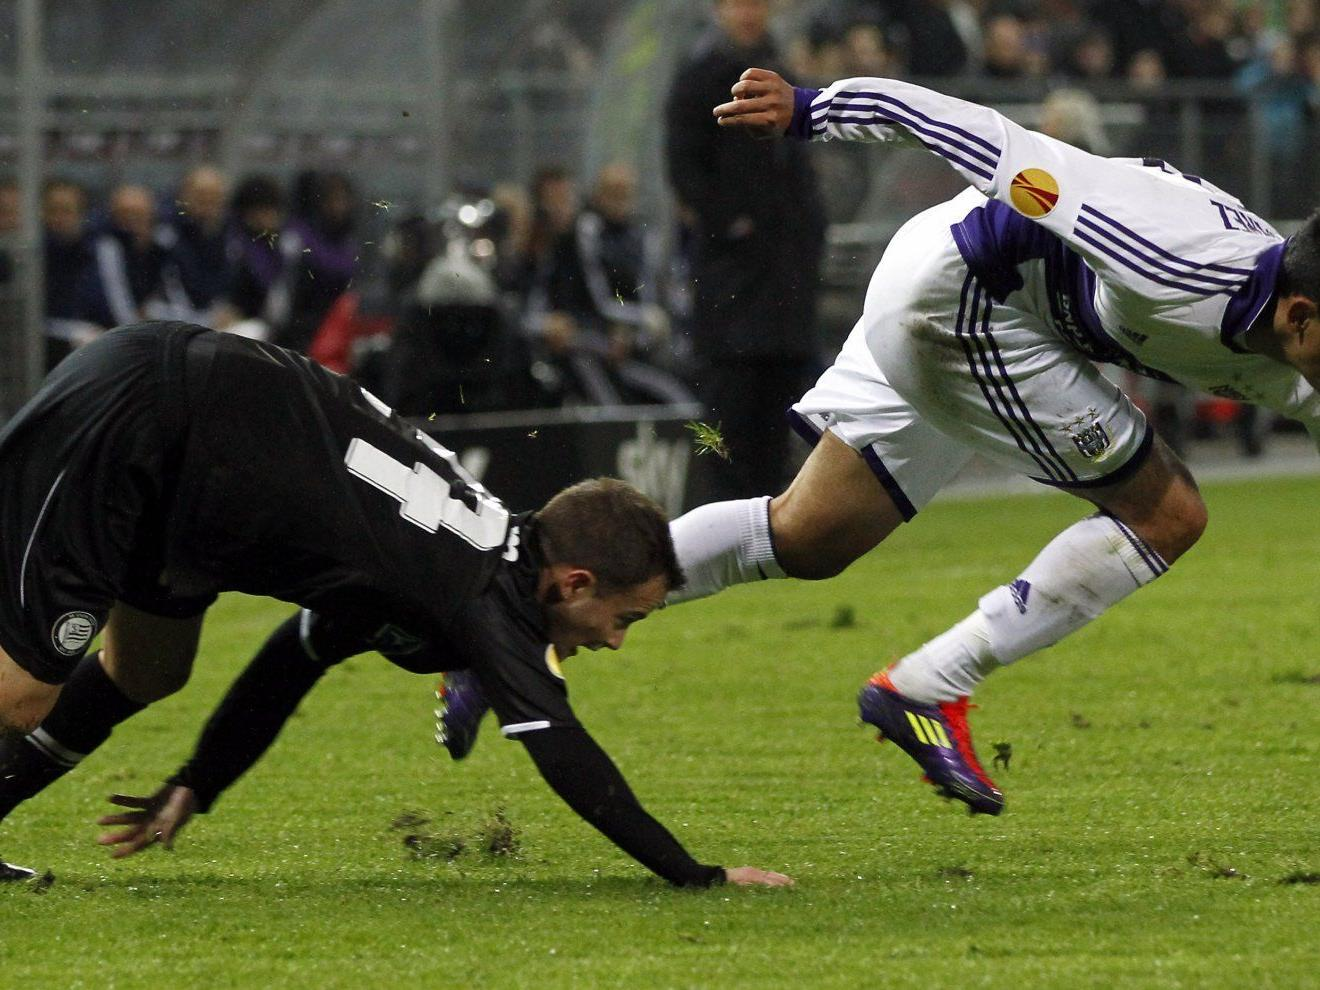 Sturm Graz unterlag RSC Anderlecht in Europa League mit 0:2.